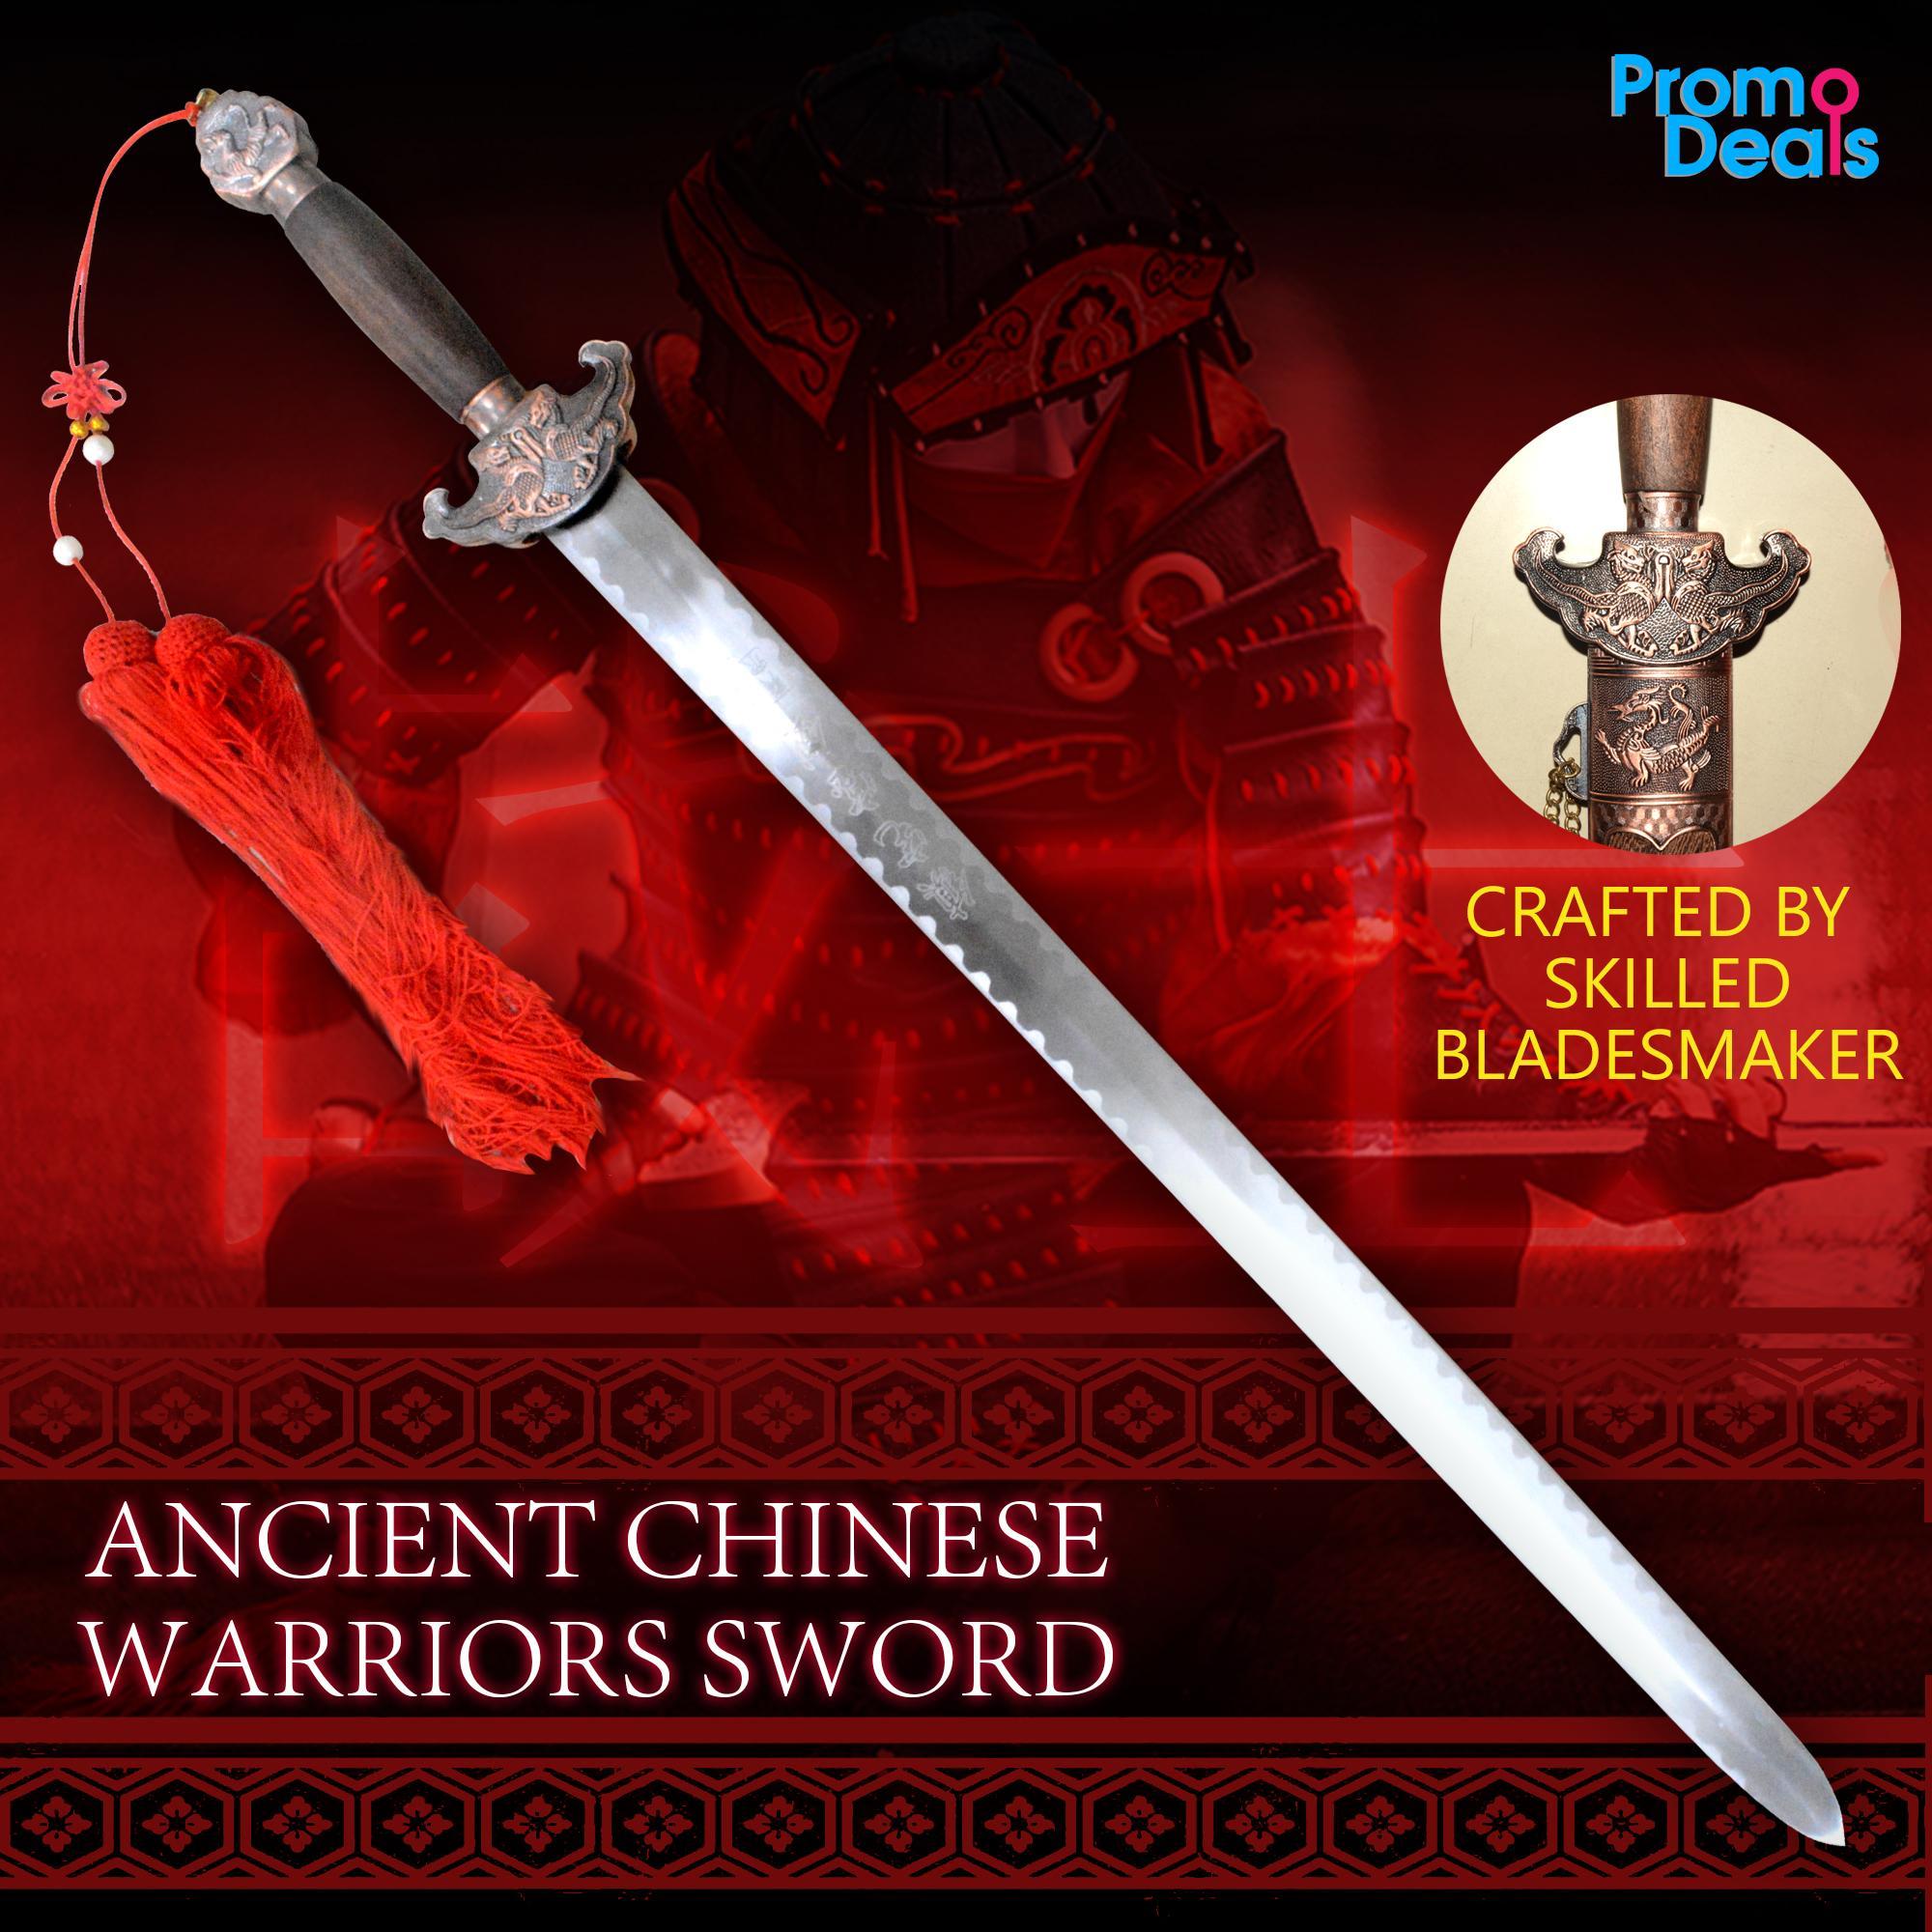 Traditiional Ancient Chinese Katana Stainless Steel